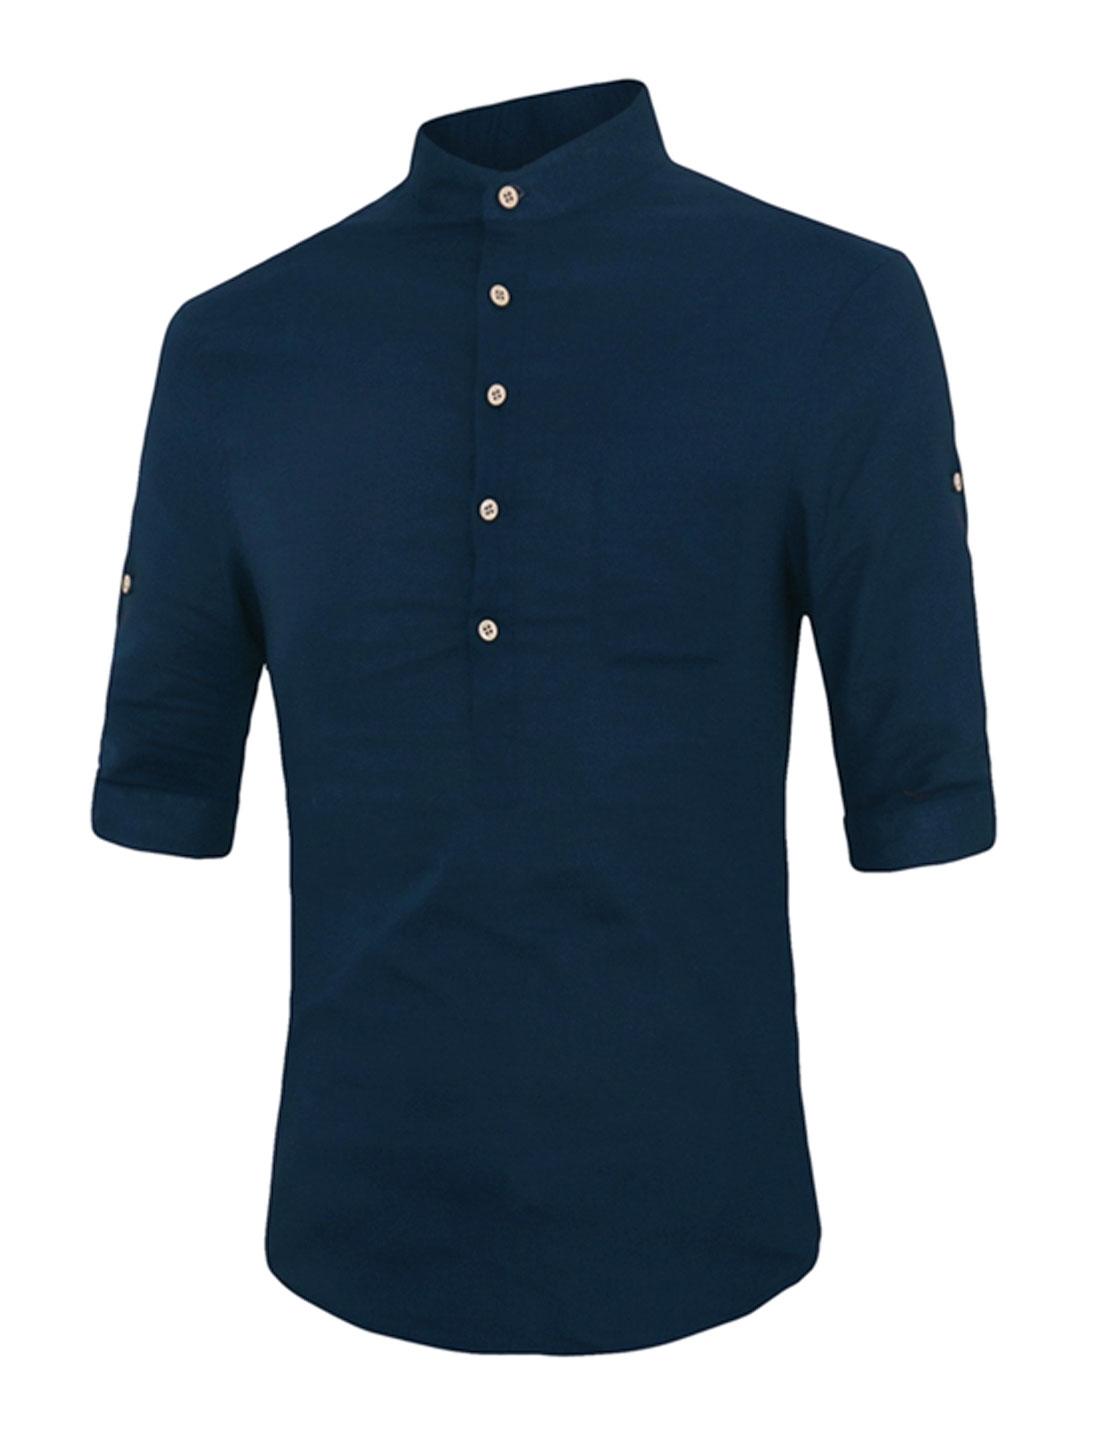 Men Stand Collar Roll Up Sleeves Split Sides Button Upper Shirt Dark Blue M